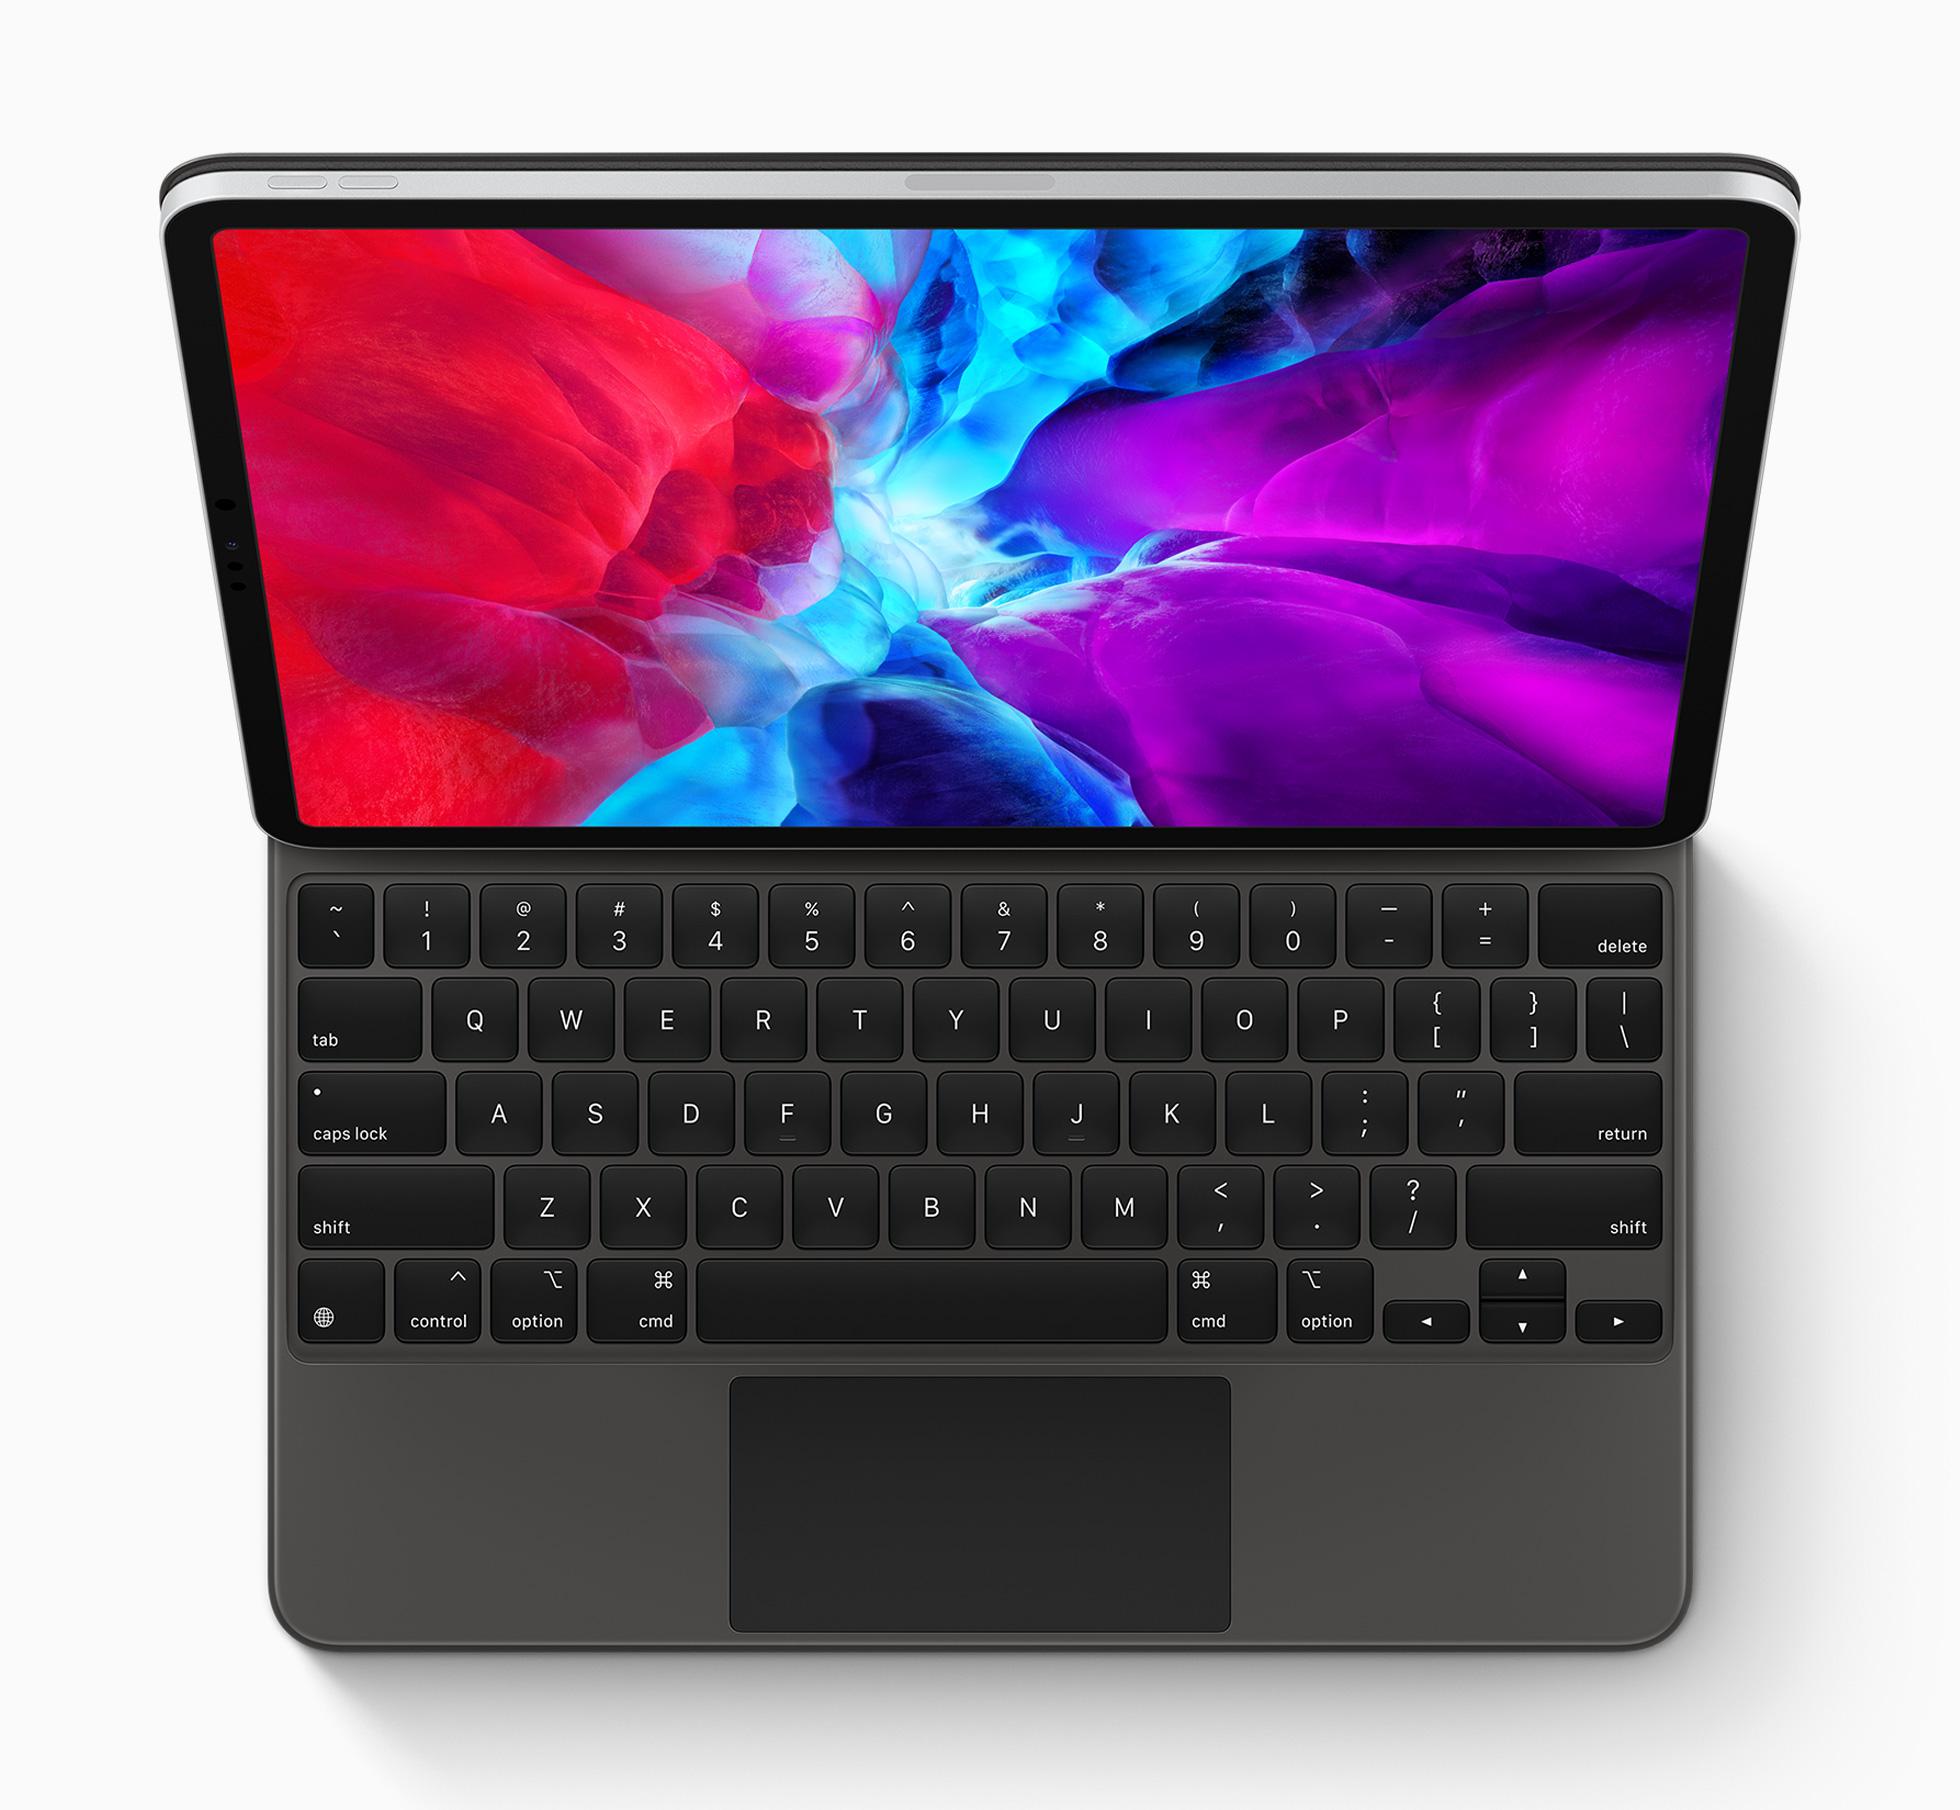 Apple_new-ipad-pro-keyboard_03182020_big.jpg.large_2x.jpg (1960×1810)